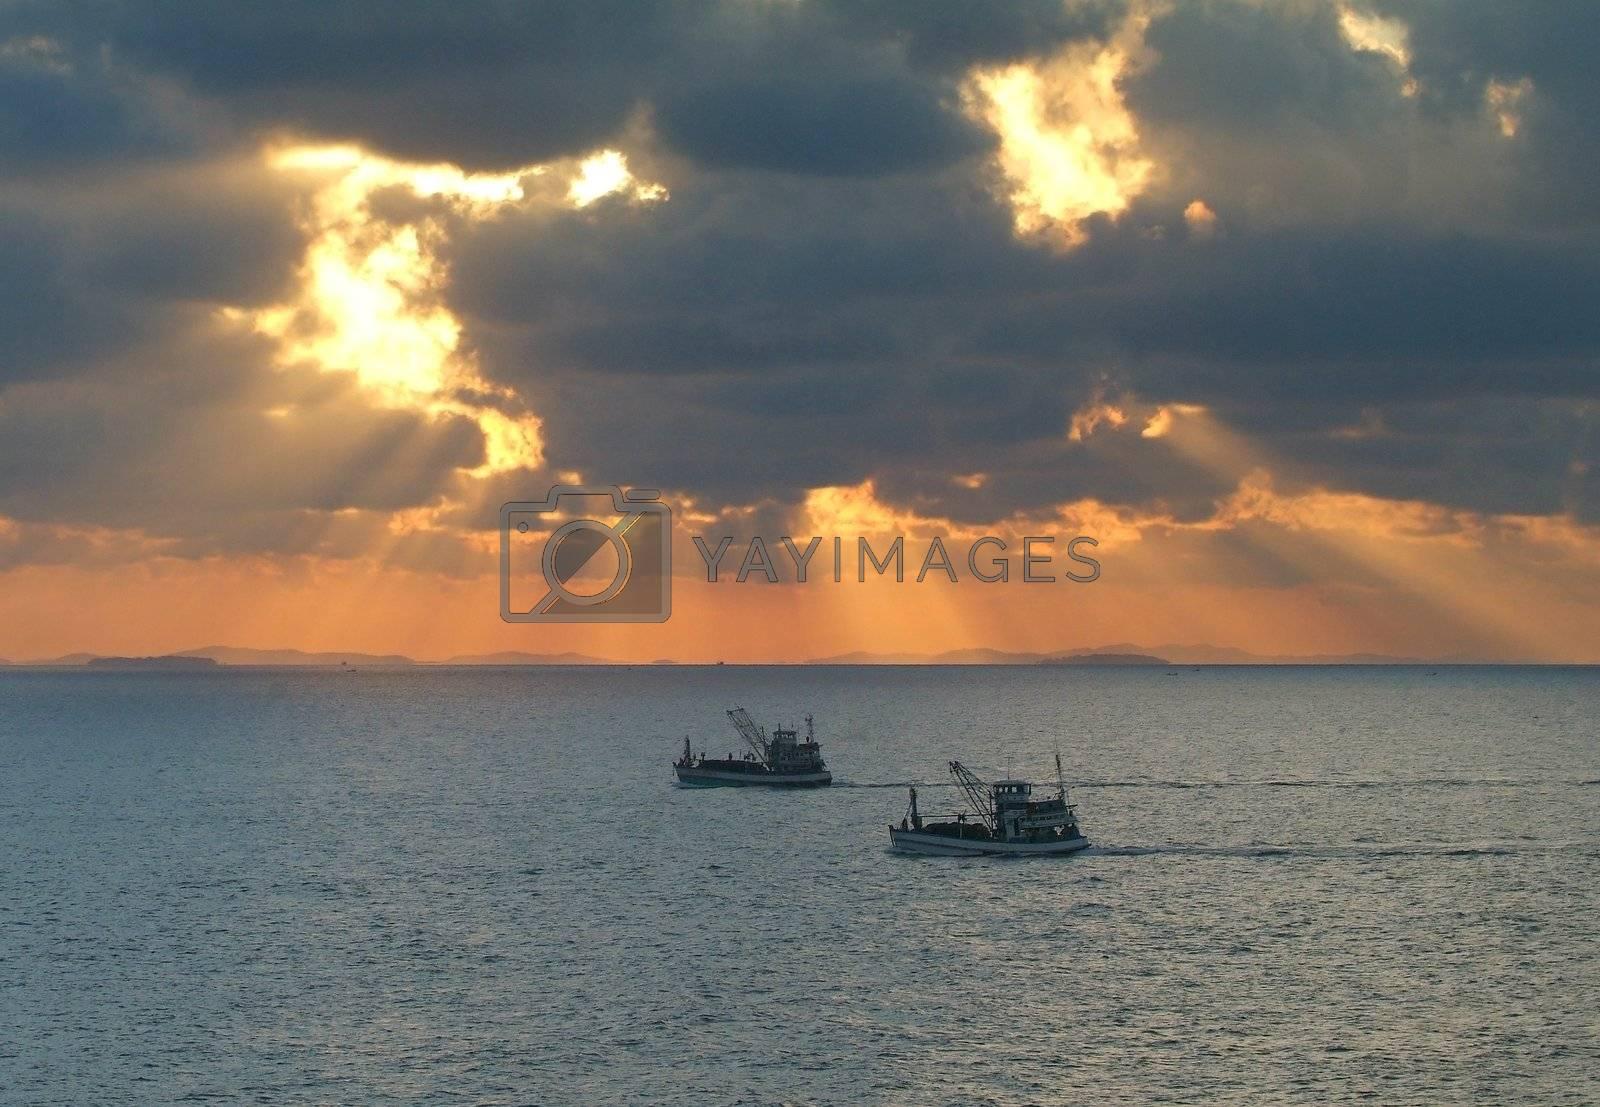 Fishing boats at sunrise by epixx